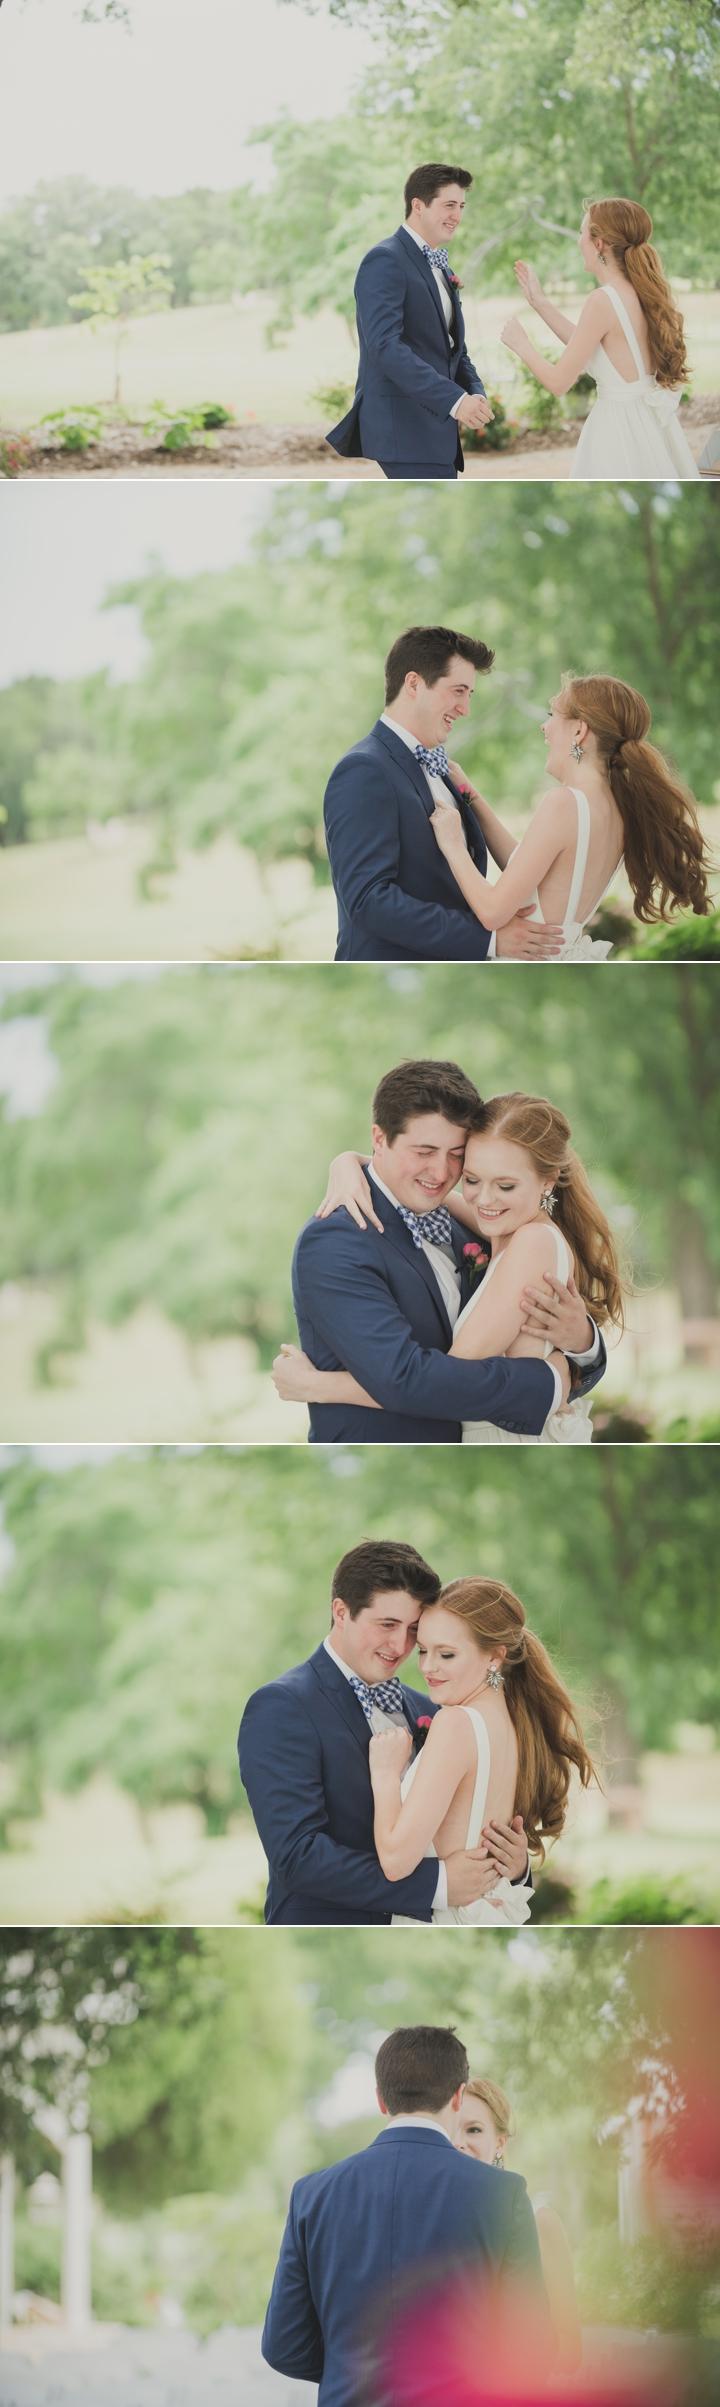 destination-wedding-photographers-ej 5.jpg